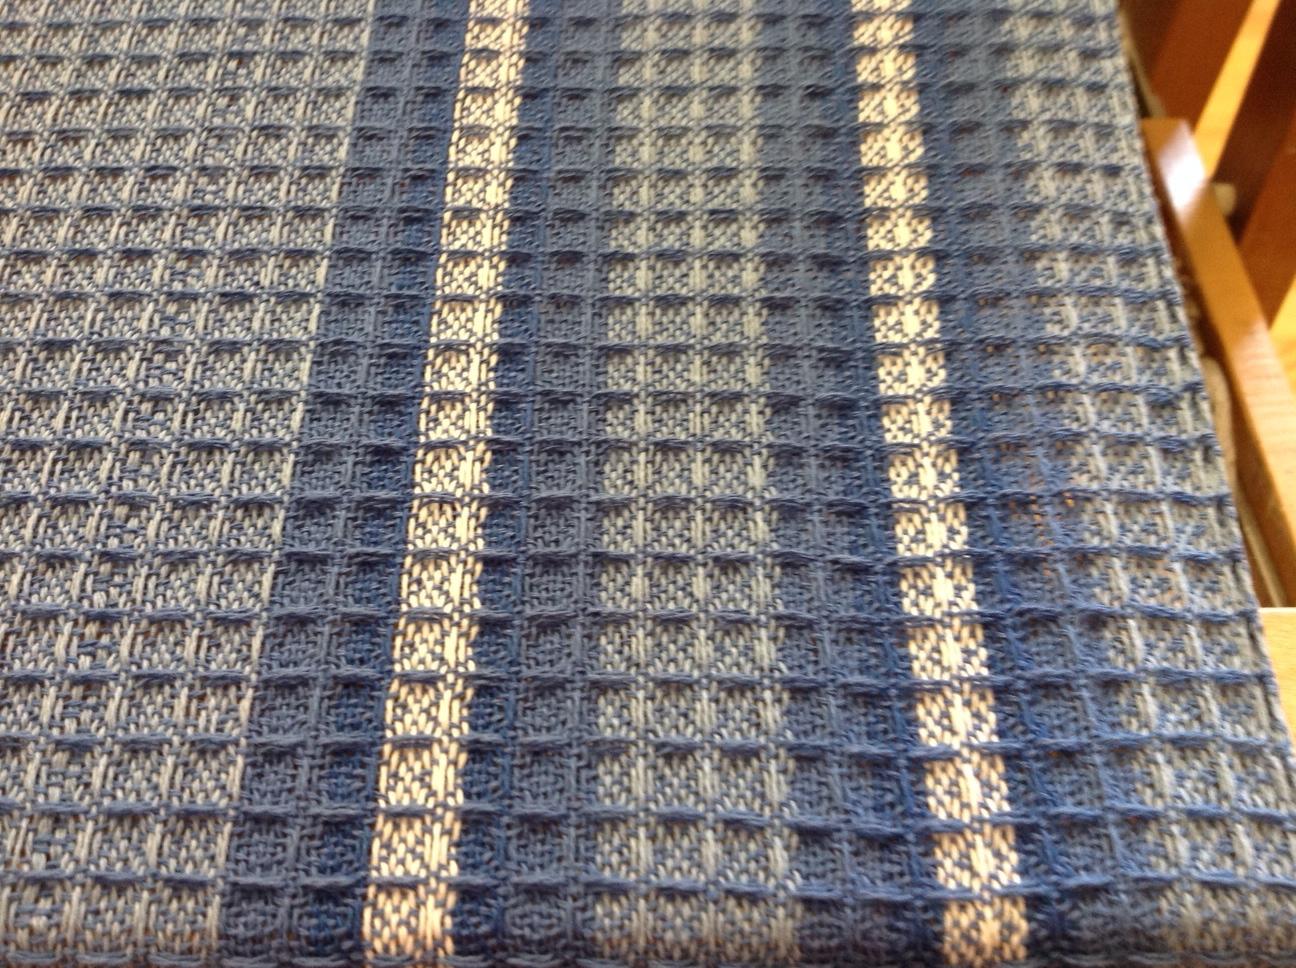 Incroyable Halcyon Waffle Weave Dish Towels Close Up The Halcyon Waffle Weave Dish  Towels Kit On The Loom